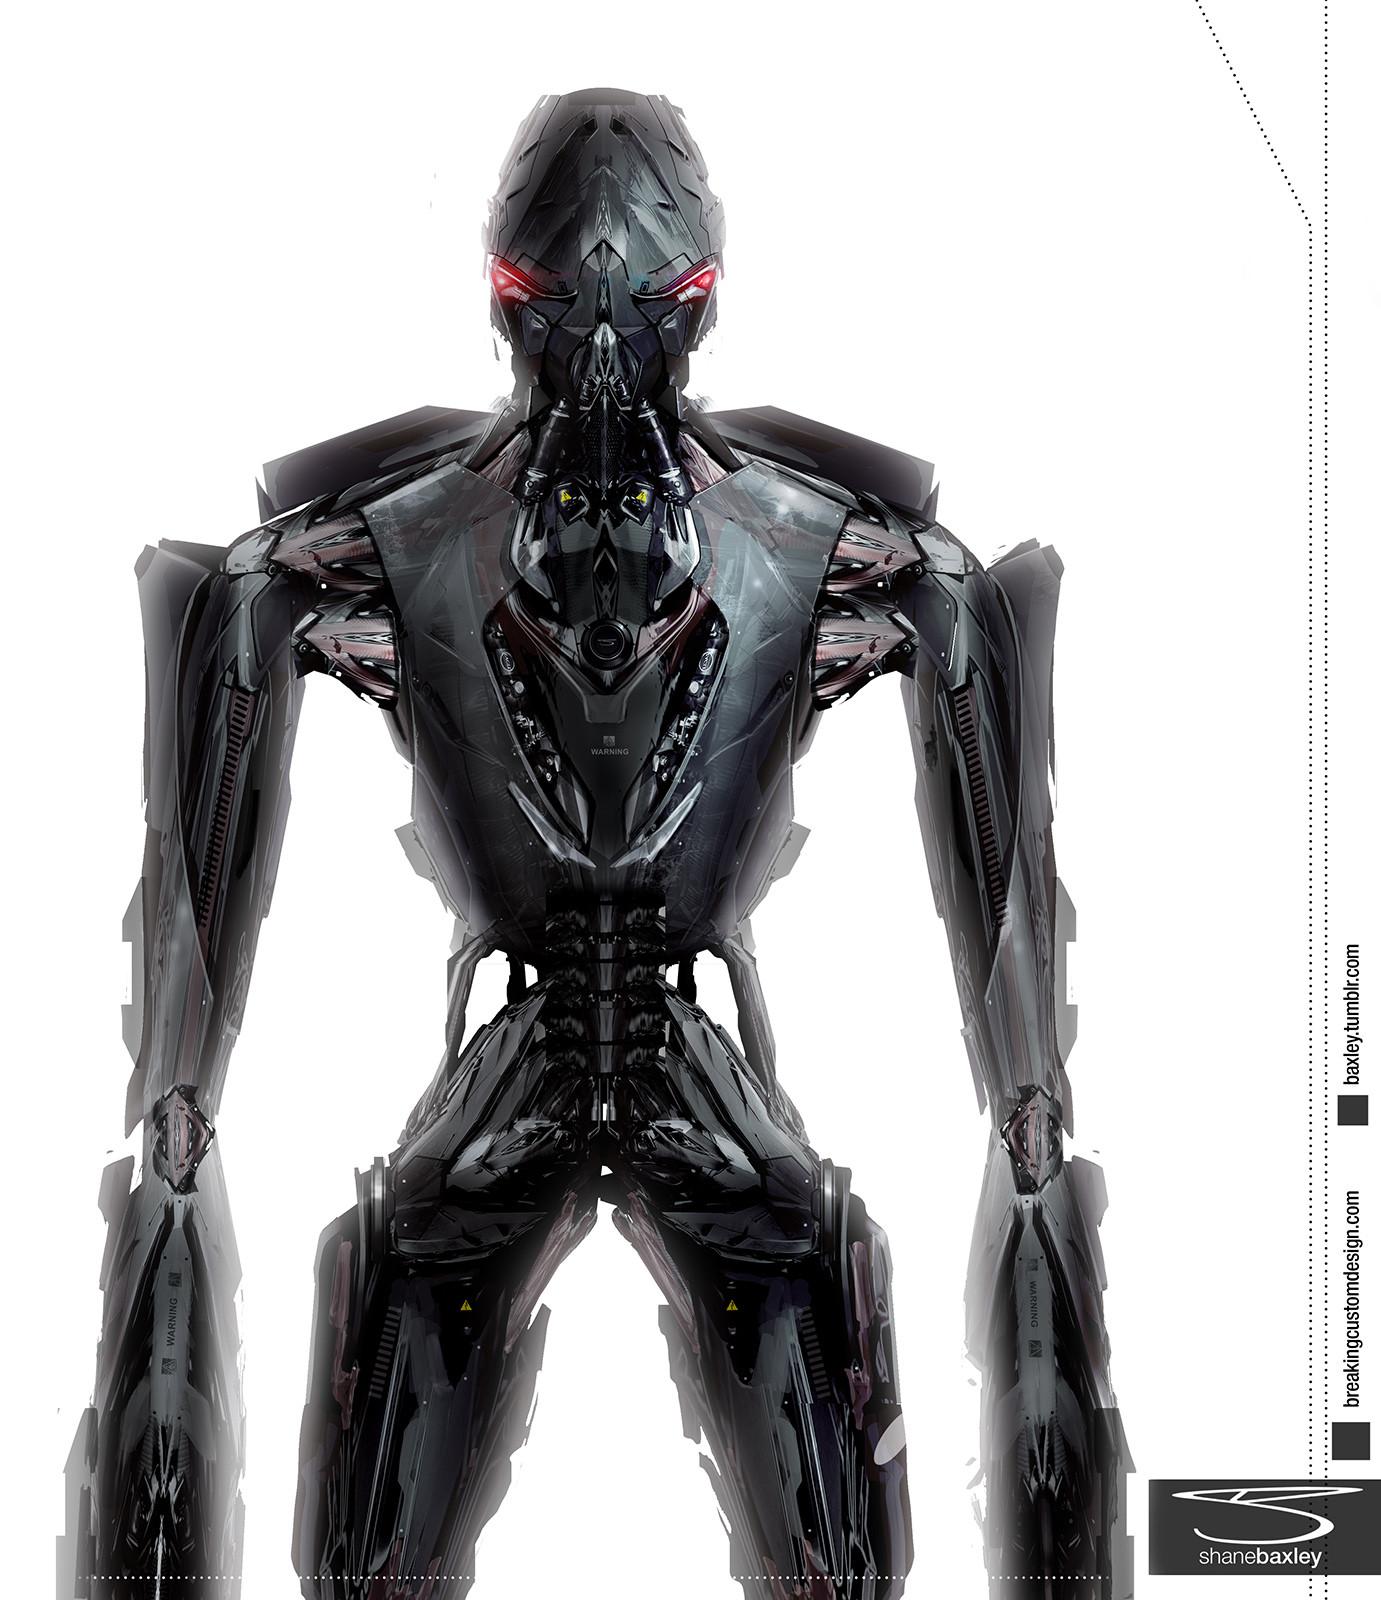 Shane baxley baxley alienrobot 1 1 lo